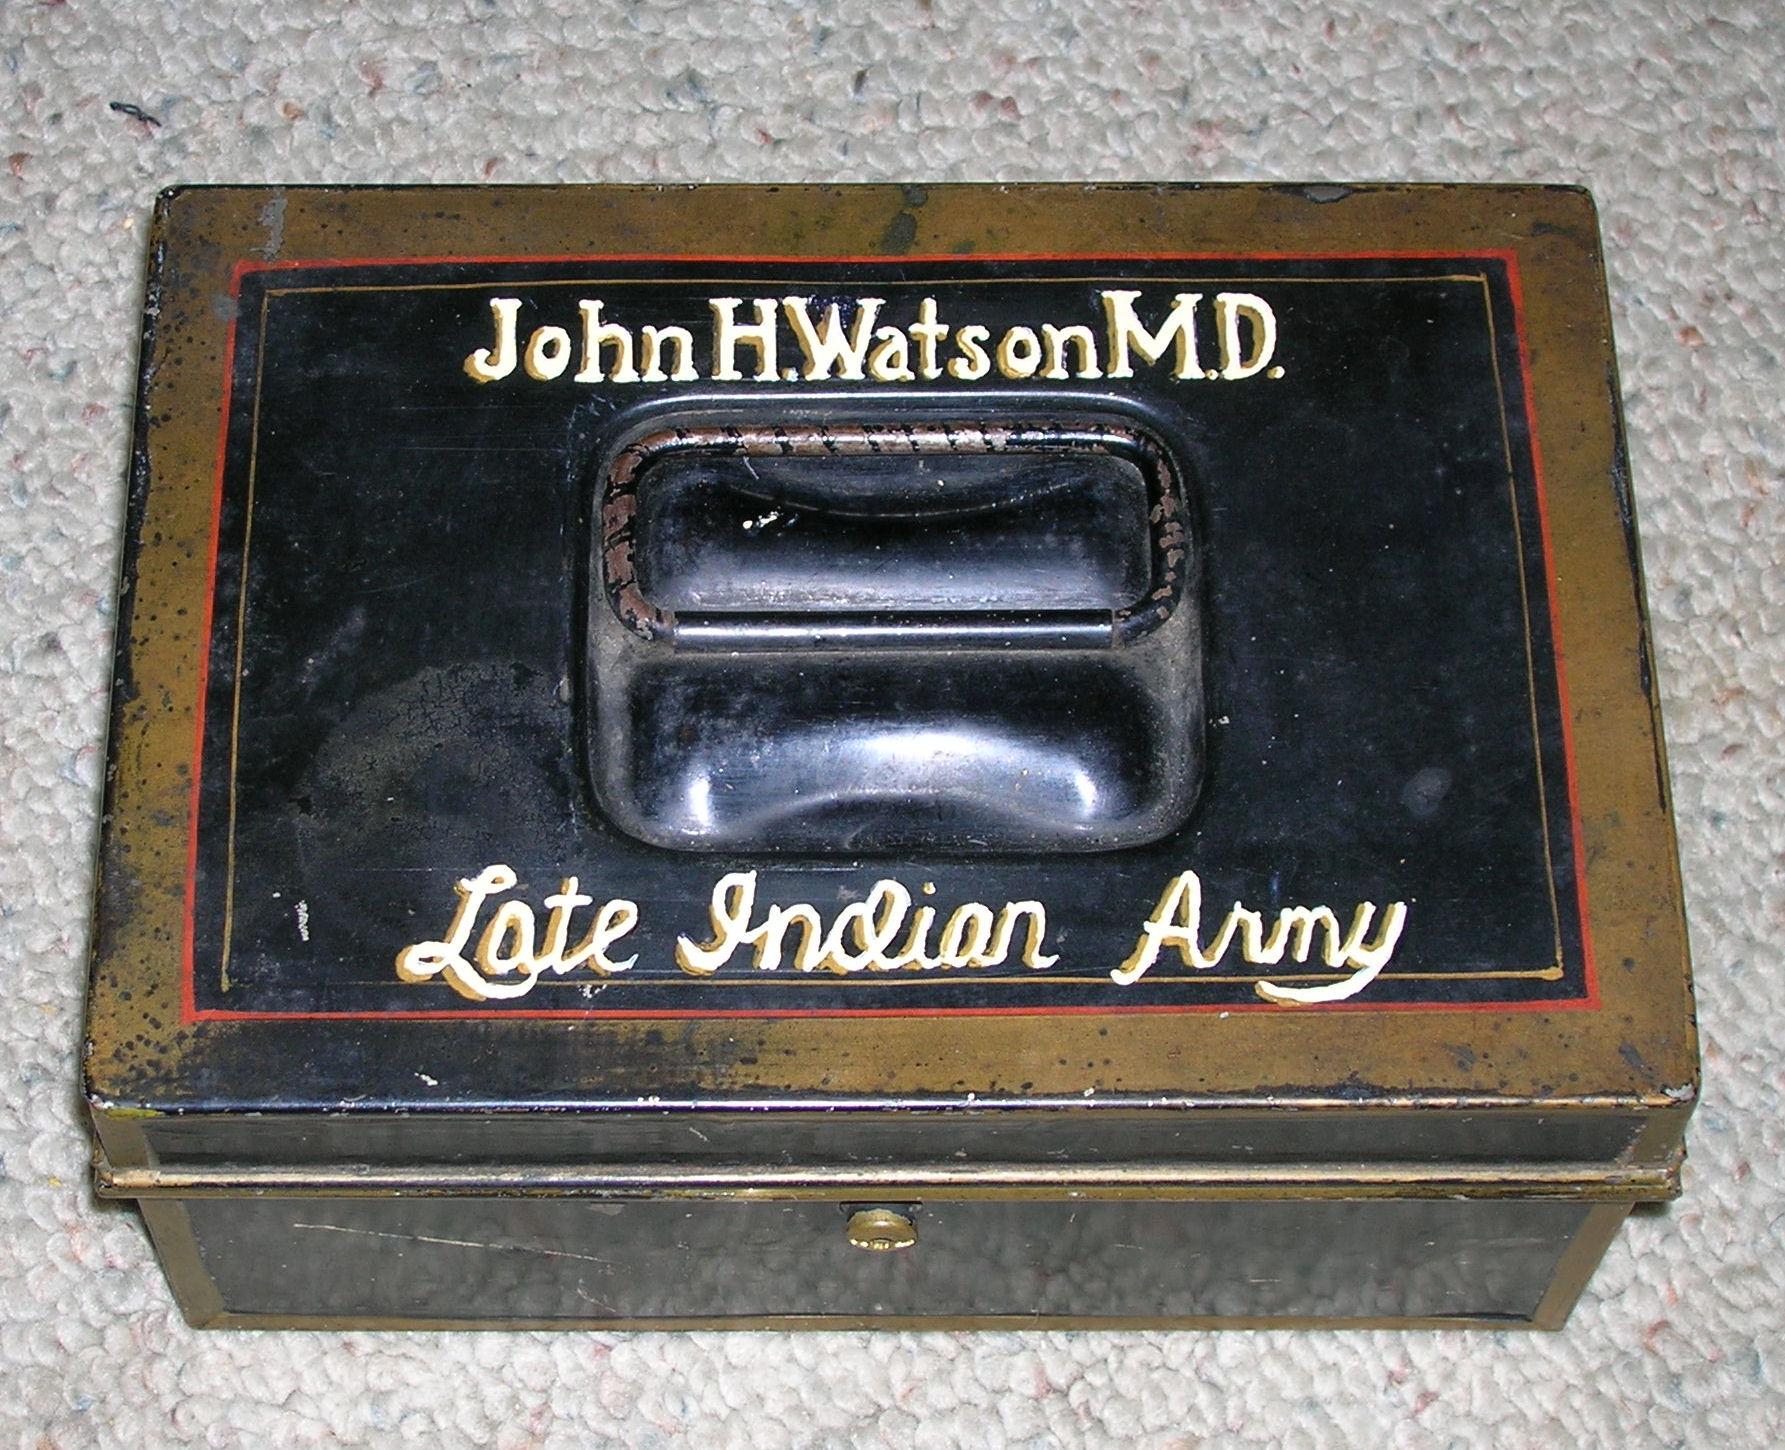 From Watson's Tin Box: The Beryl Coronet